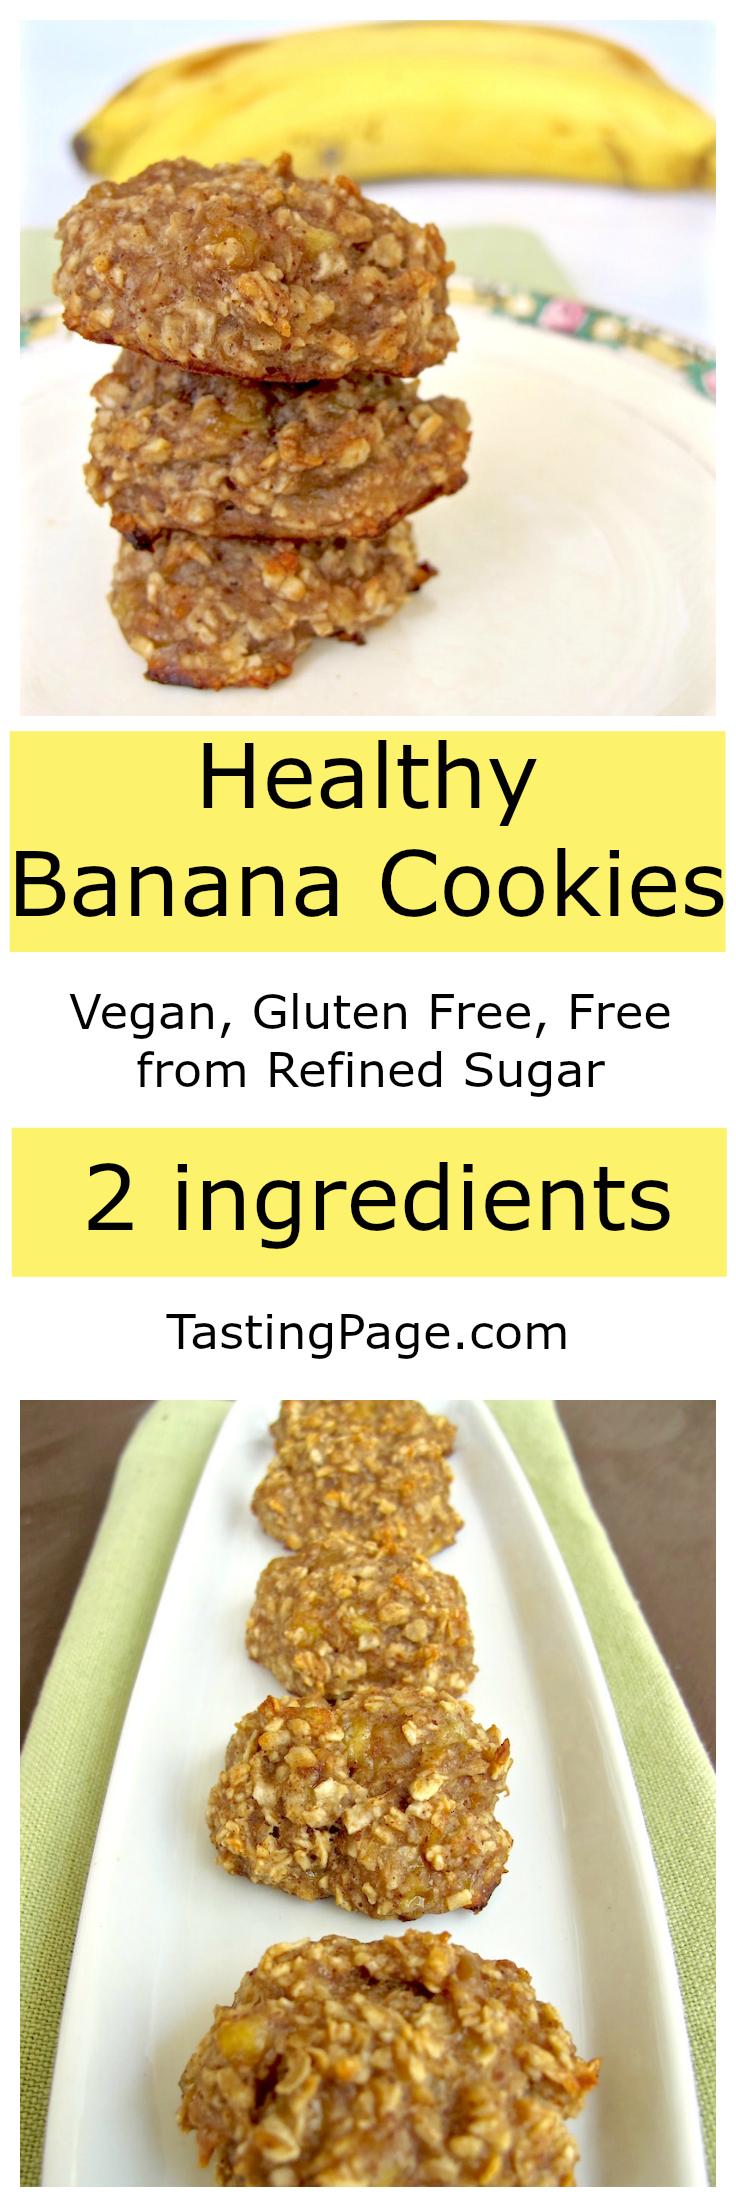 Healthy Banana Cookies - Vegan, gluten free, free from refined sugar | TastingPage.com